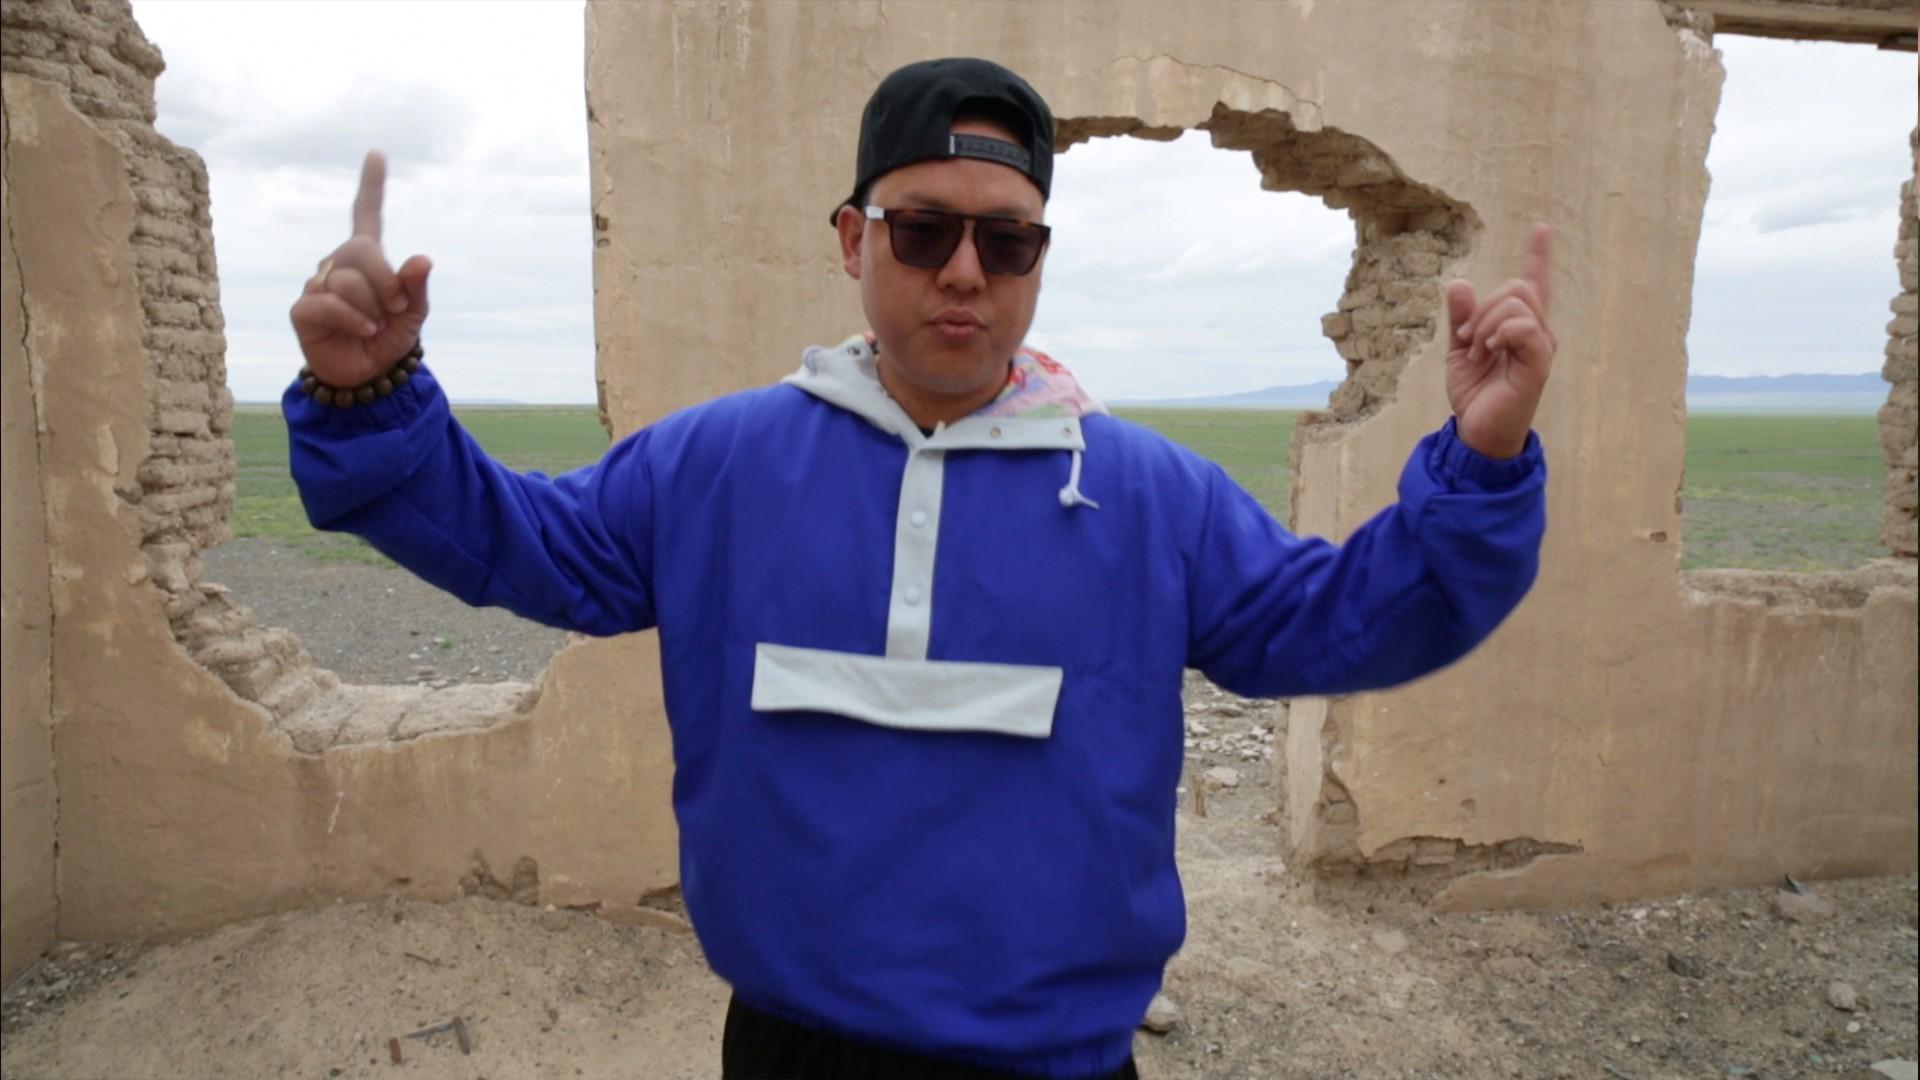 ulaanbaatar lesbian singles Negative traits of capricorn find local lesbian singlesbrowse ulaanbaatar girls stop waiting, start dating latino singles start dating ulaanbaatar girls.